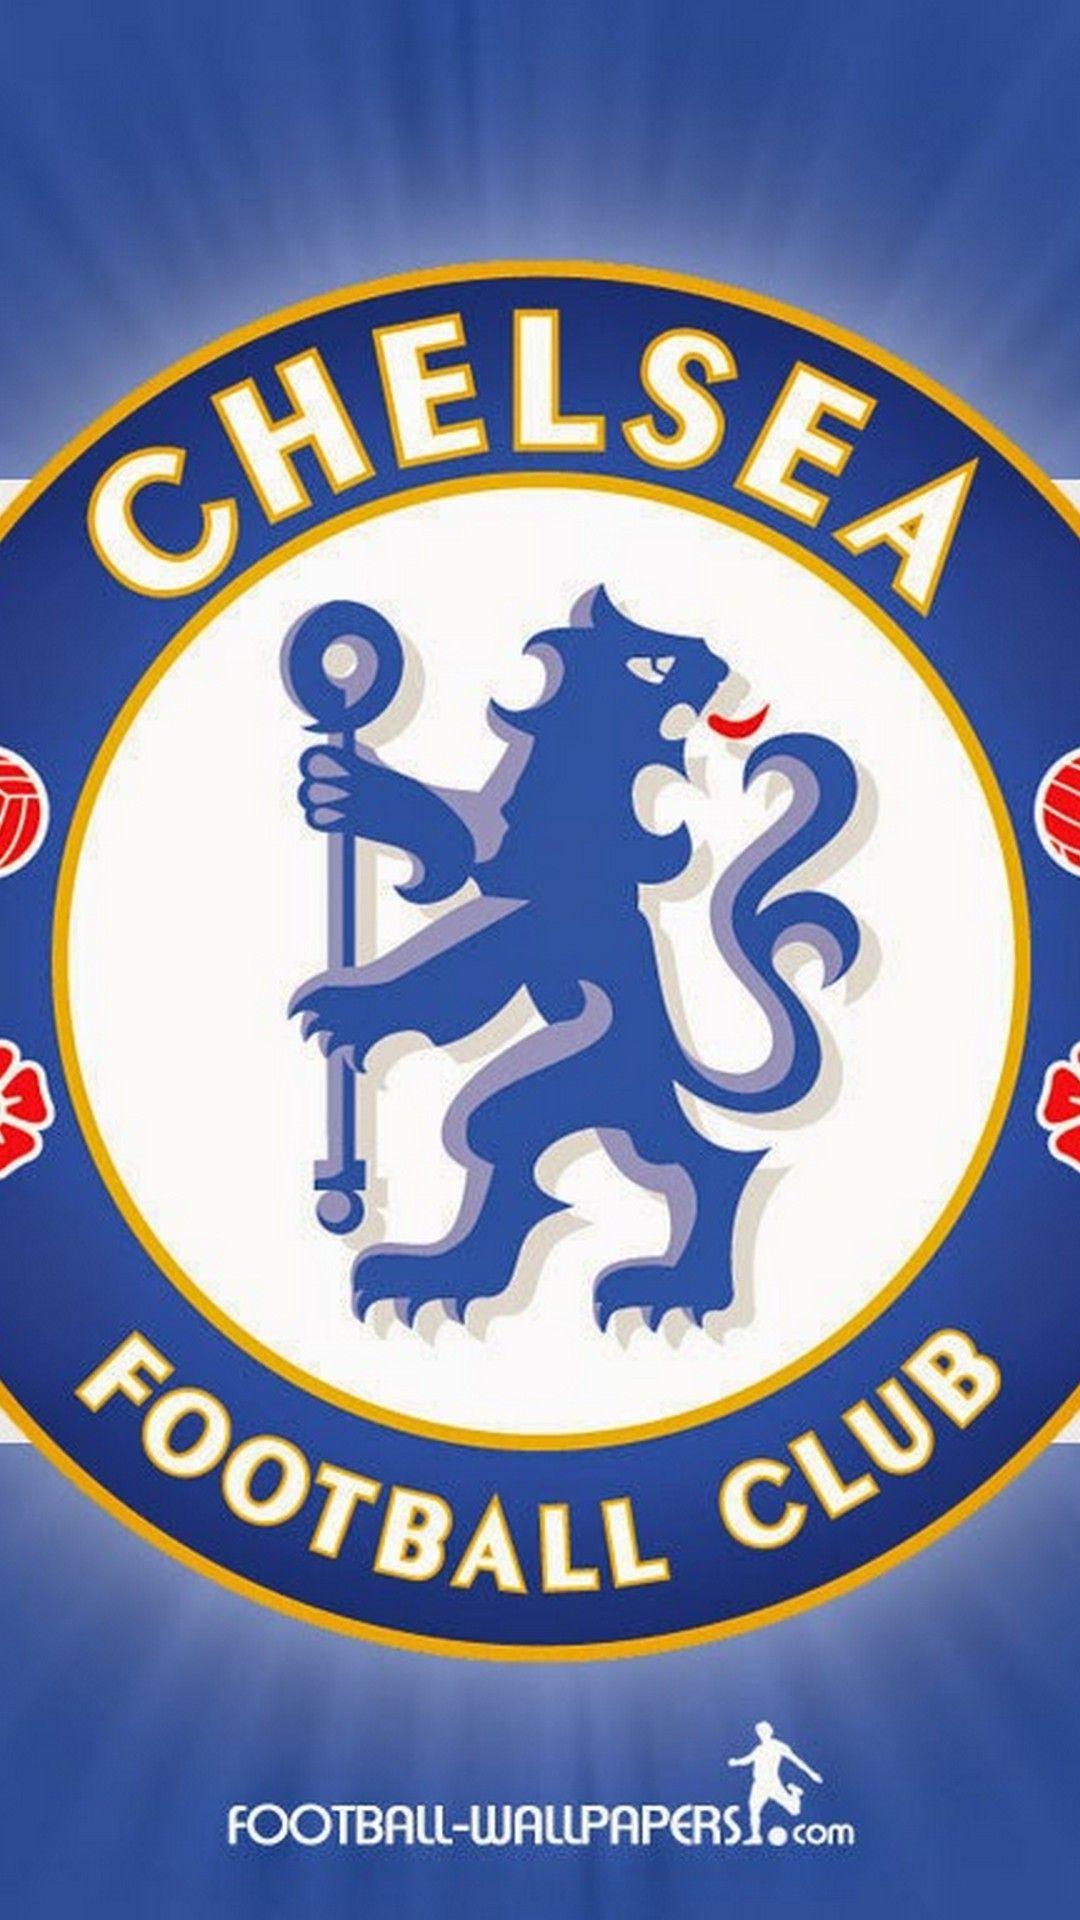 Chelsea Football Club Iphone X Wallpaper Best Wallpaper Hd Football Wallpaper Chelsea Football Club Wallpapers Chelsea Wallpapers